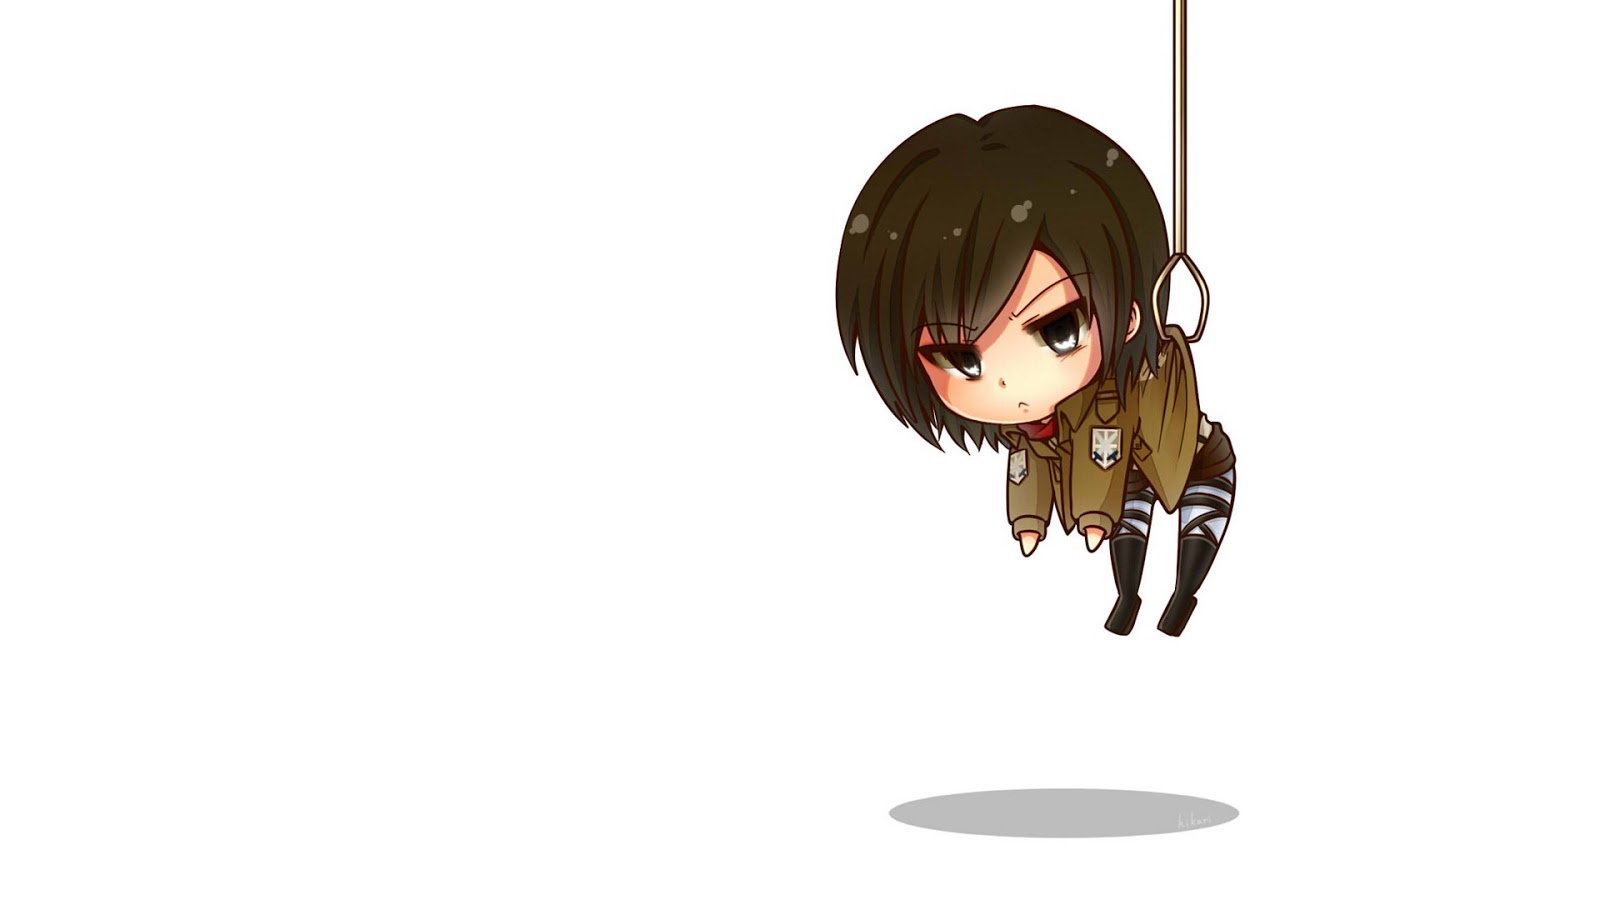 Chibi Cute Attack on Titan Shingeki no Kyojin Girl Anime HD Wallpaper 1600x900